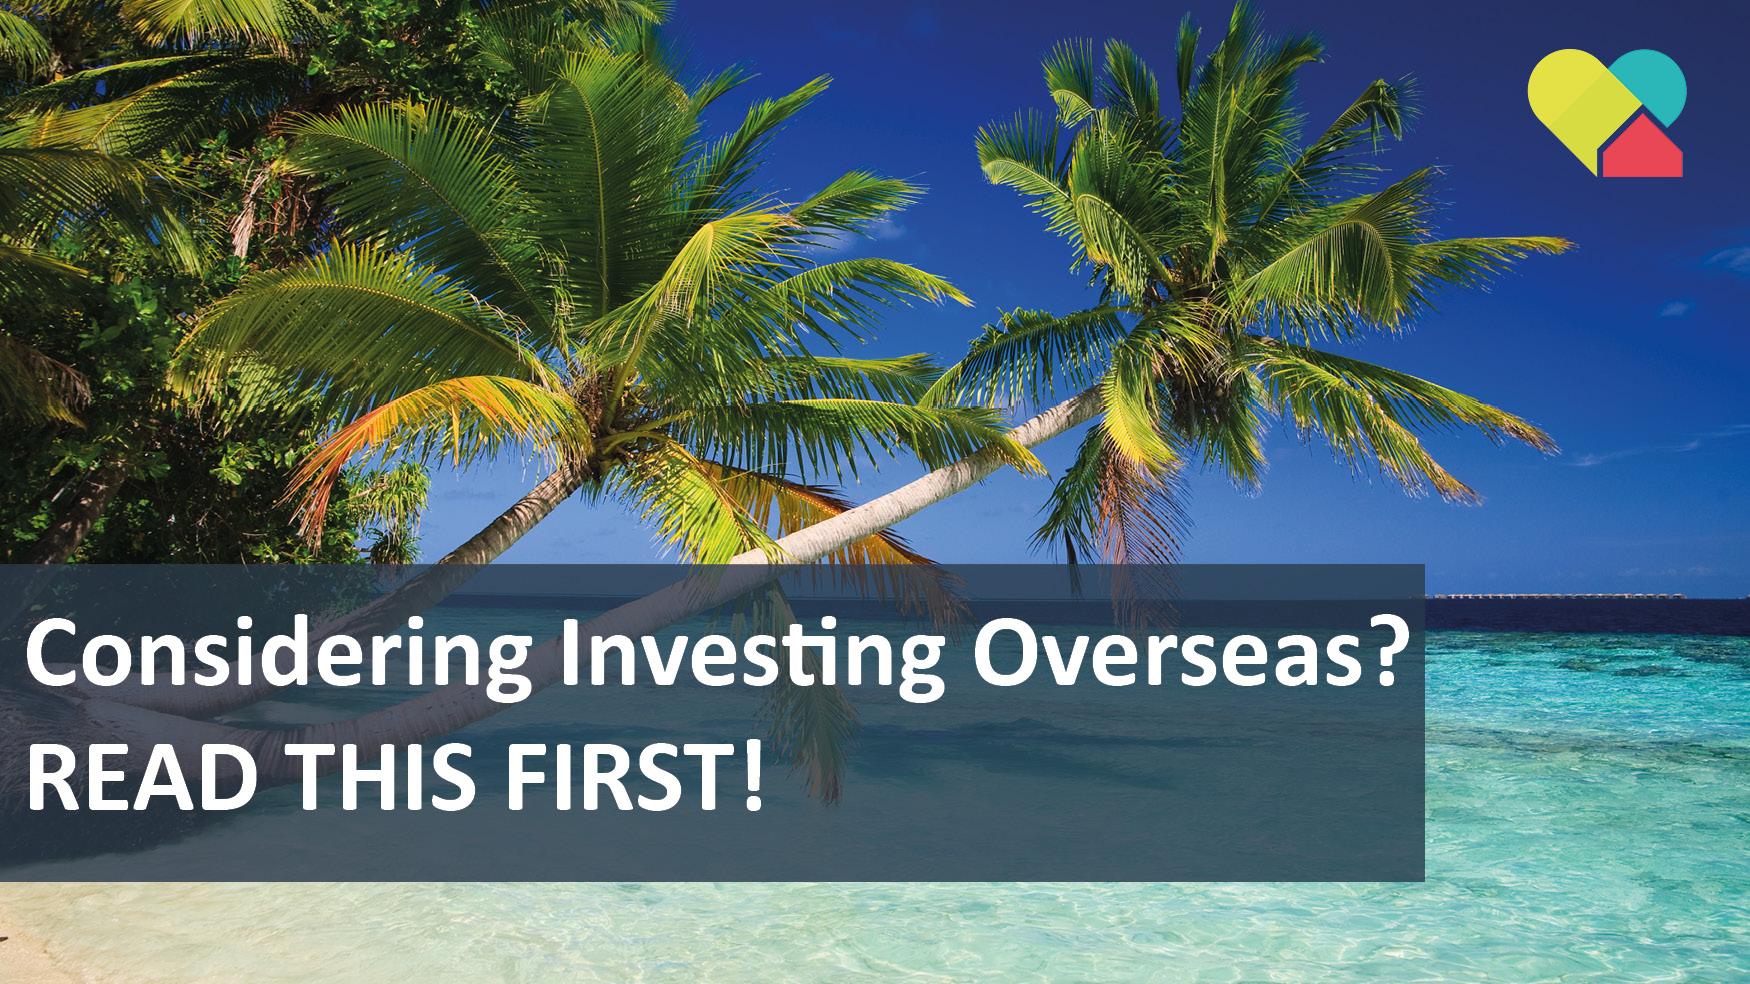 Considering Investing Overseas